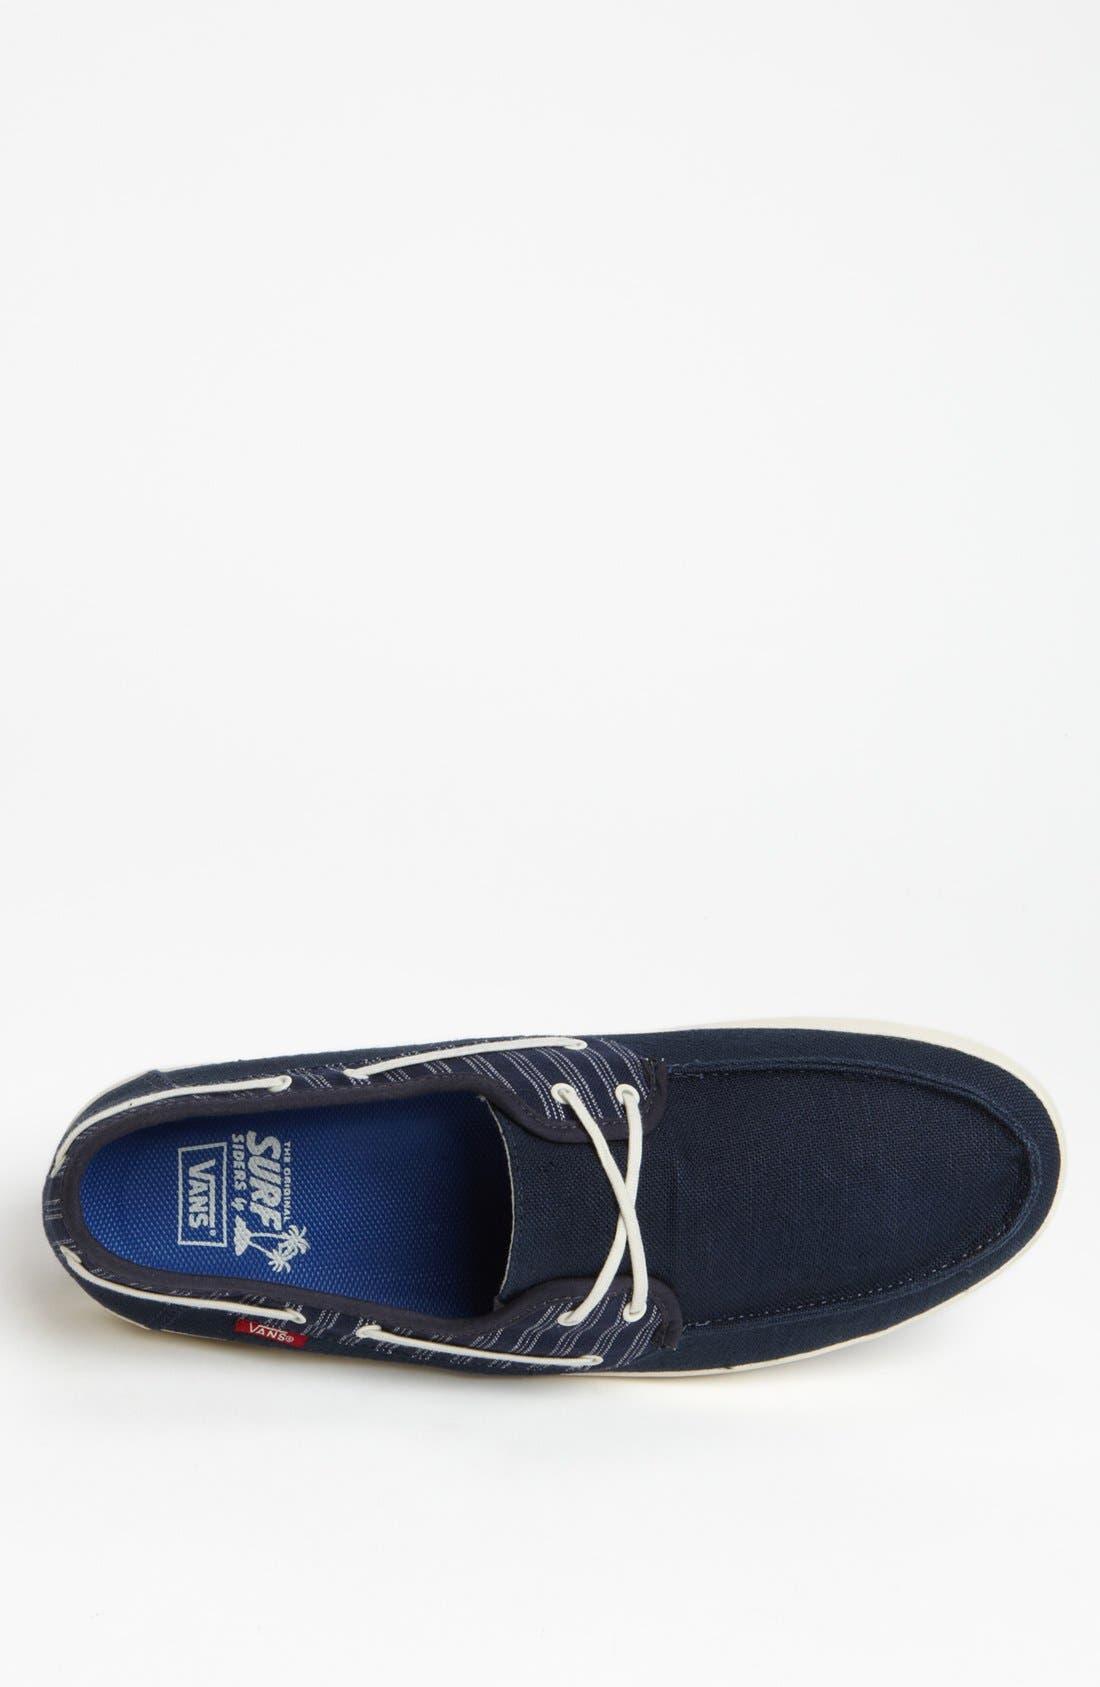 Alternate Image 3  - Vans 'Chauffeur' Boat Shoe (Men)